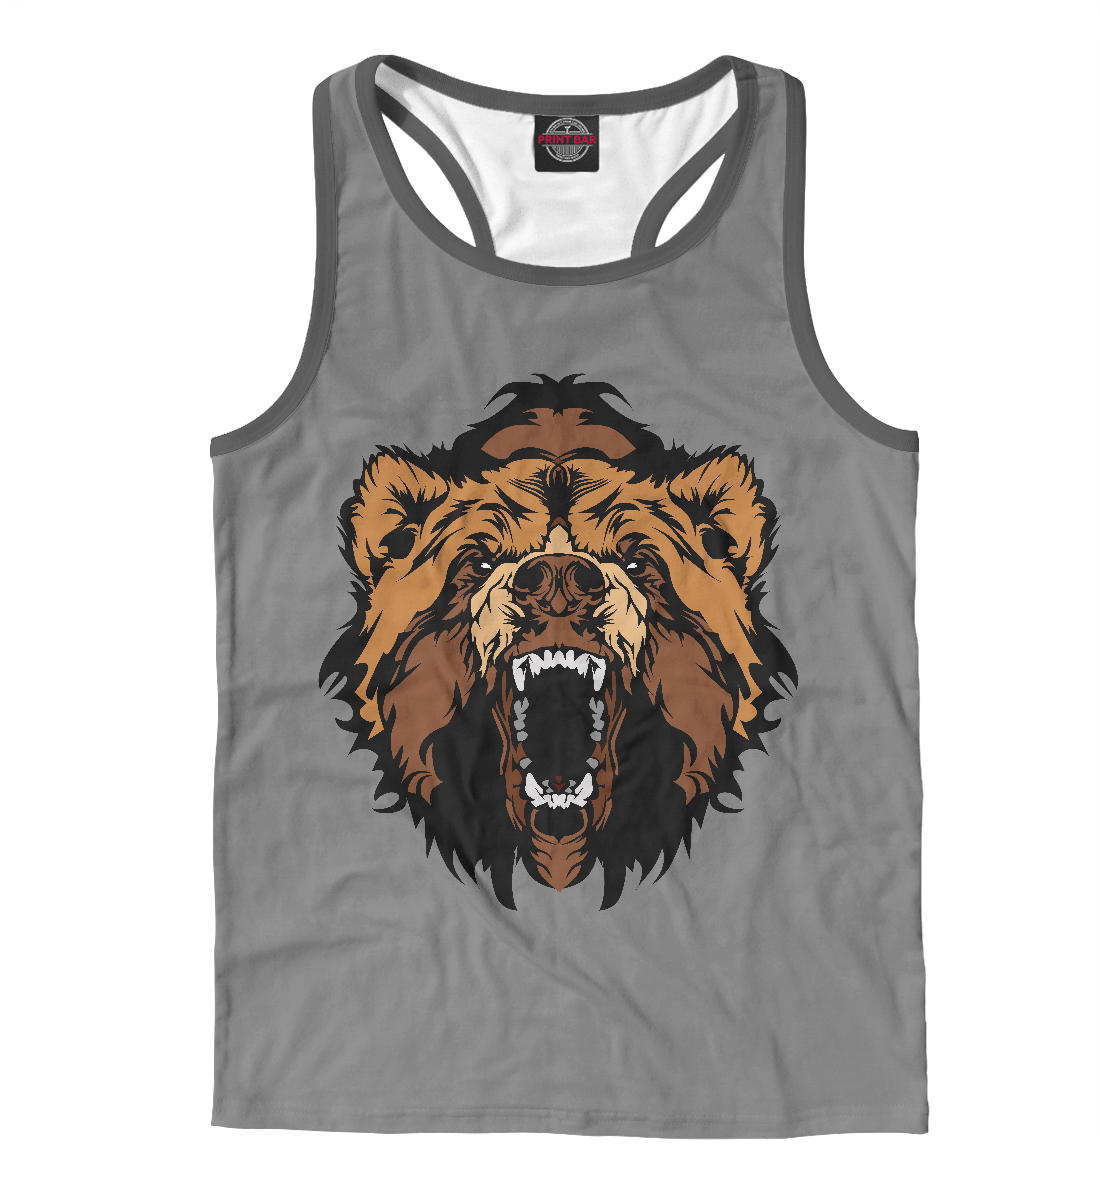 Купить Злой Медведь, Printbar, Майки борцовки, MED-793758-mayb-2